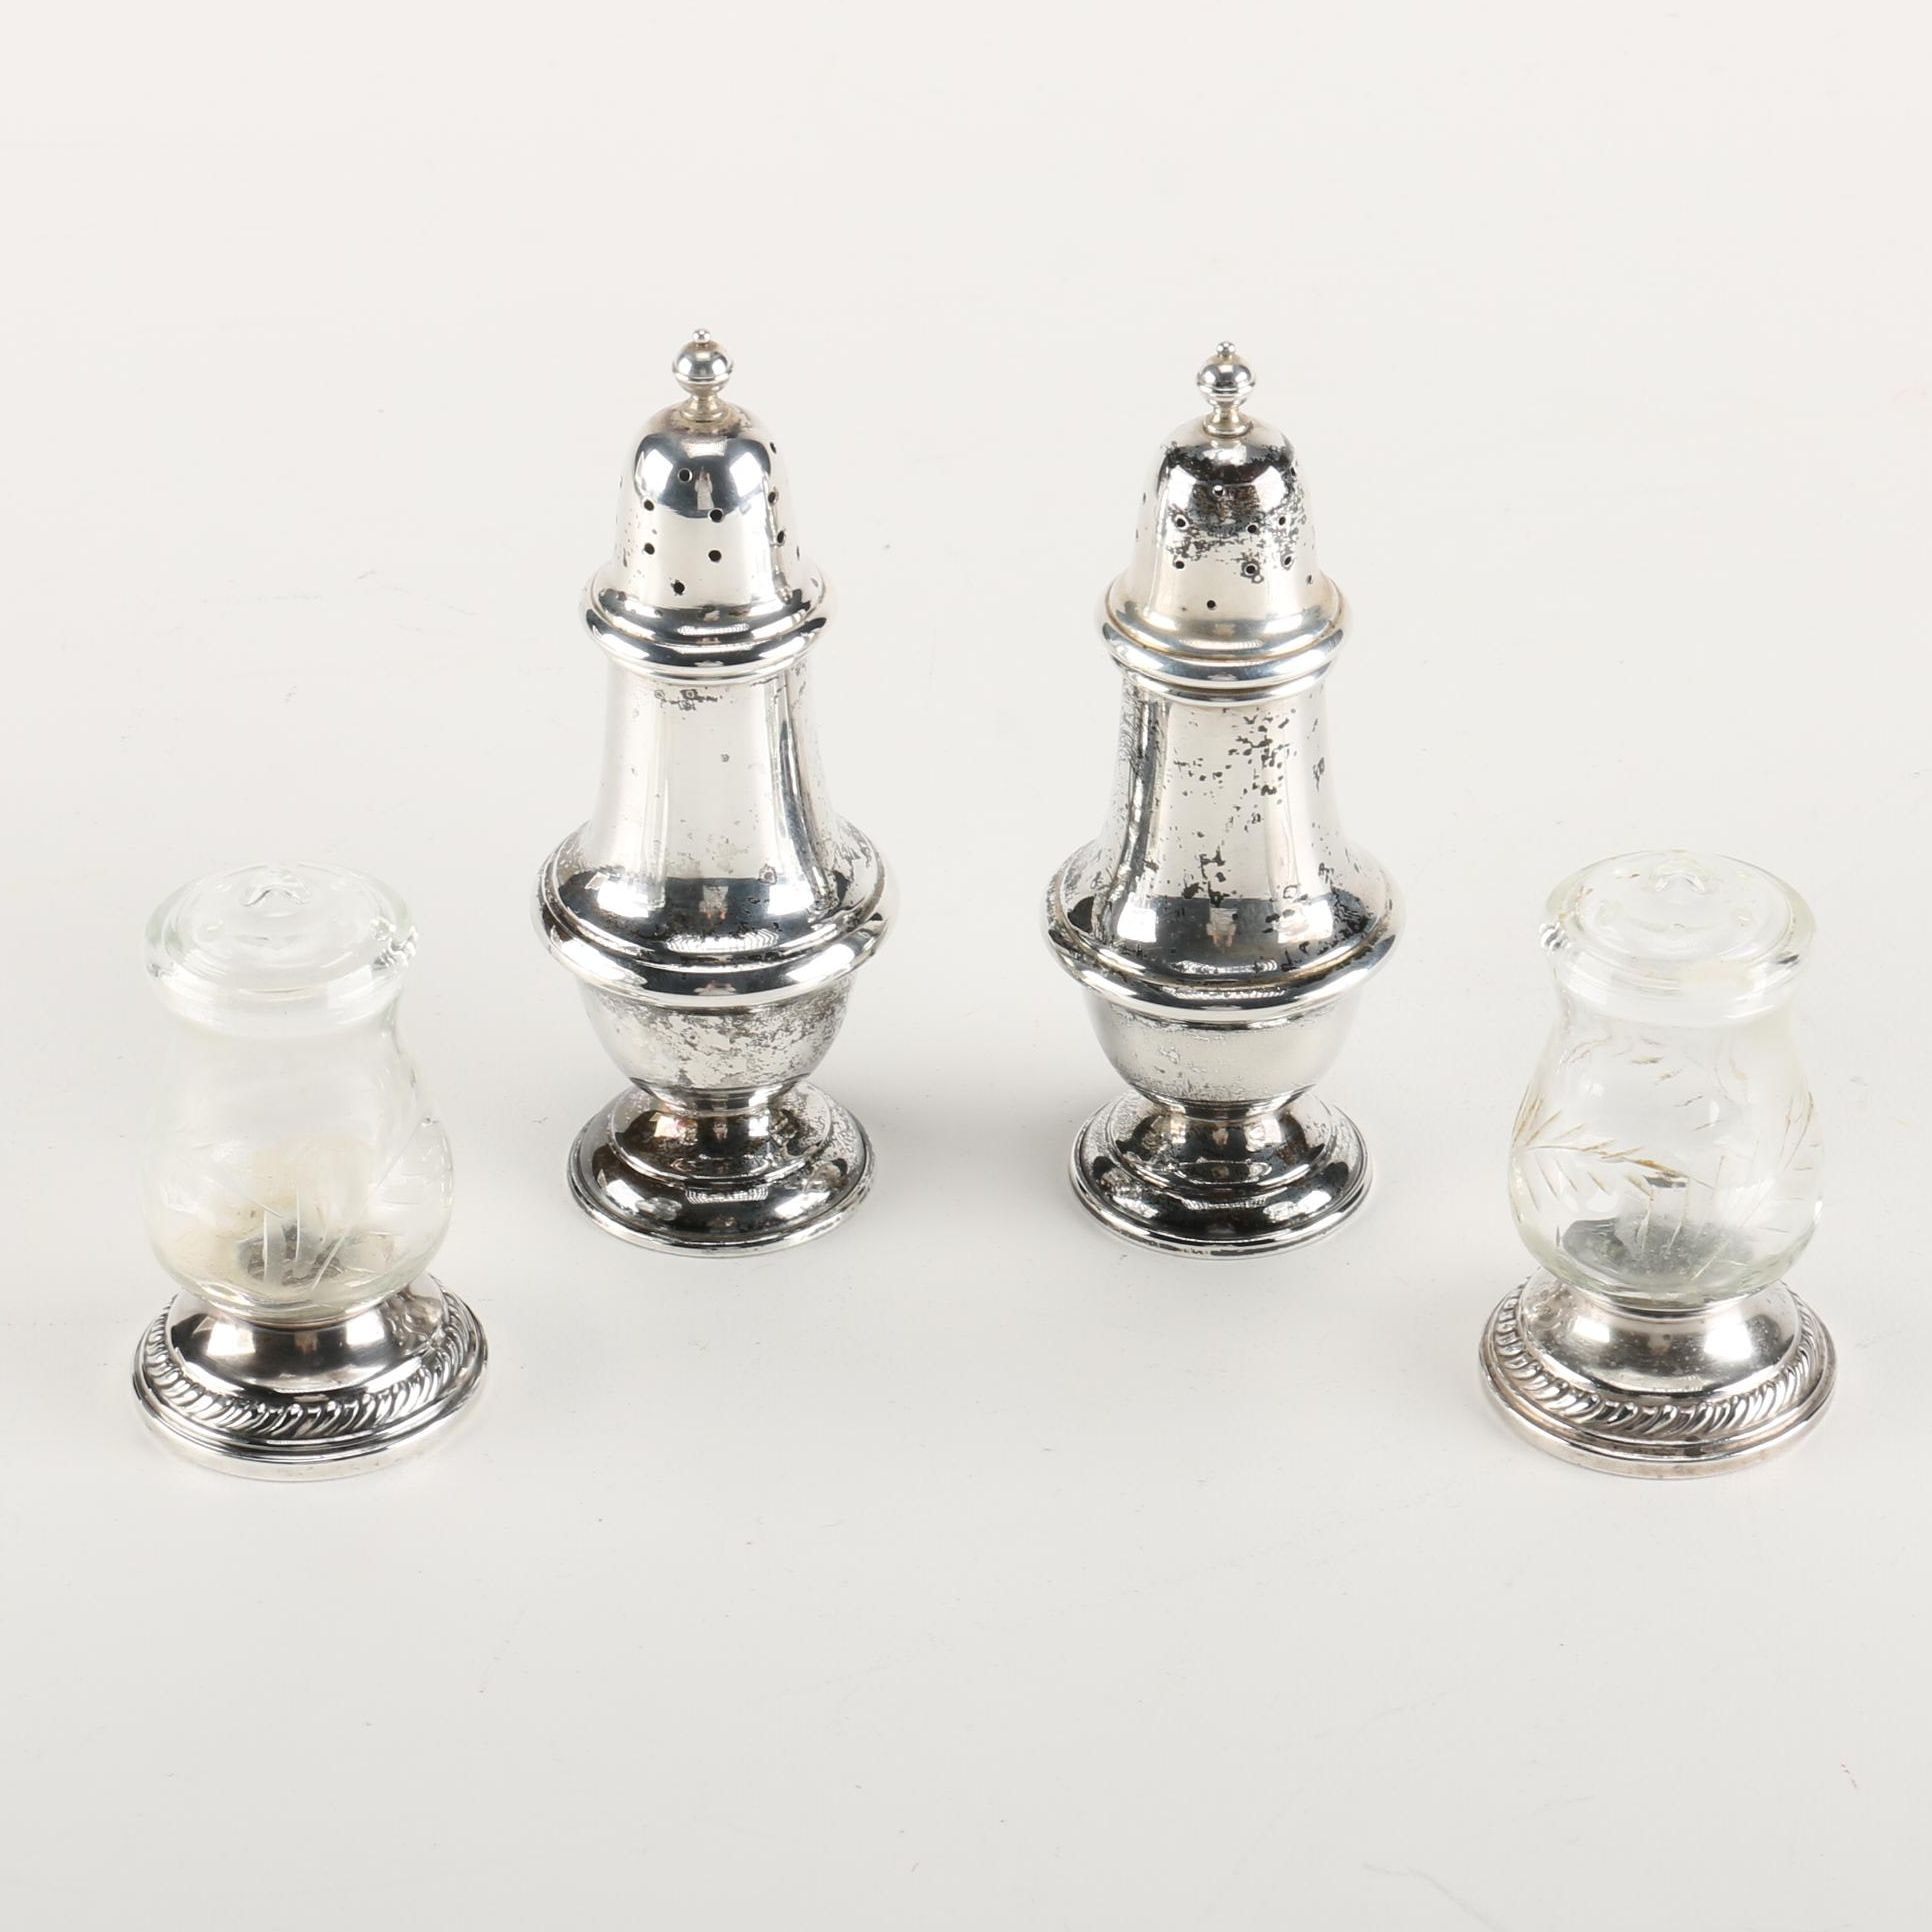 Sterling Silver Salt and Pepper Shakers Including Gorham